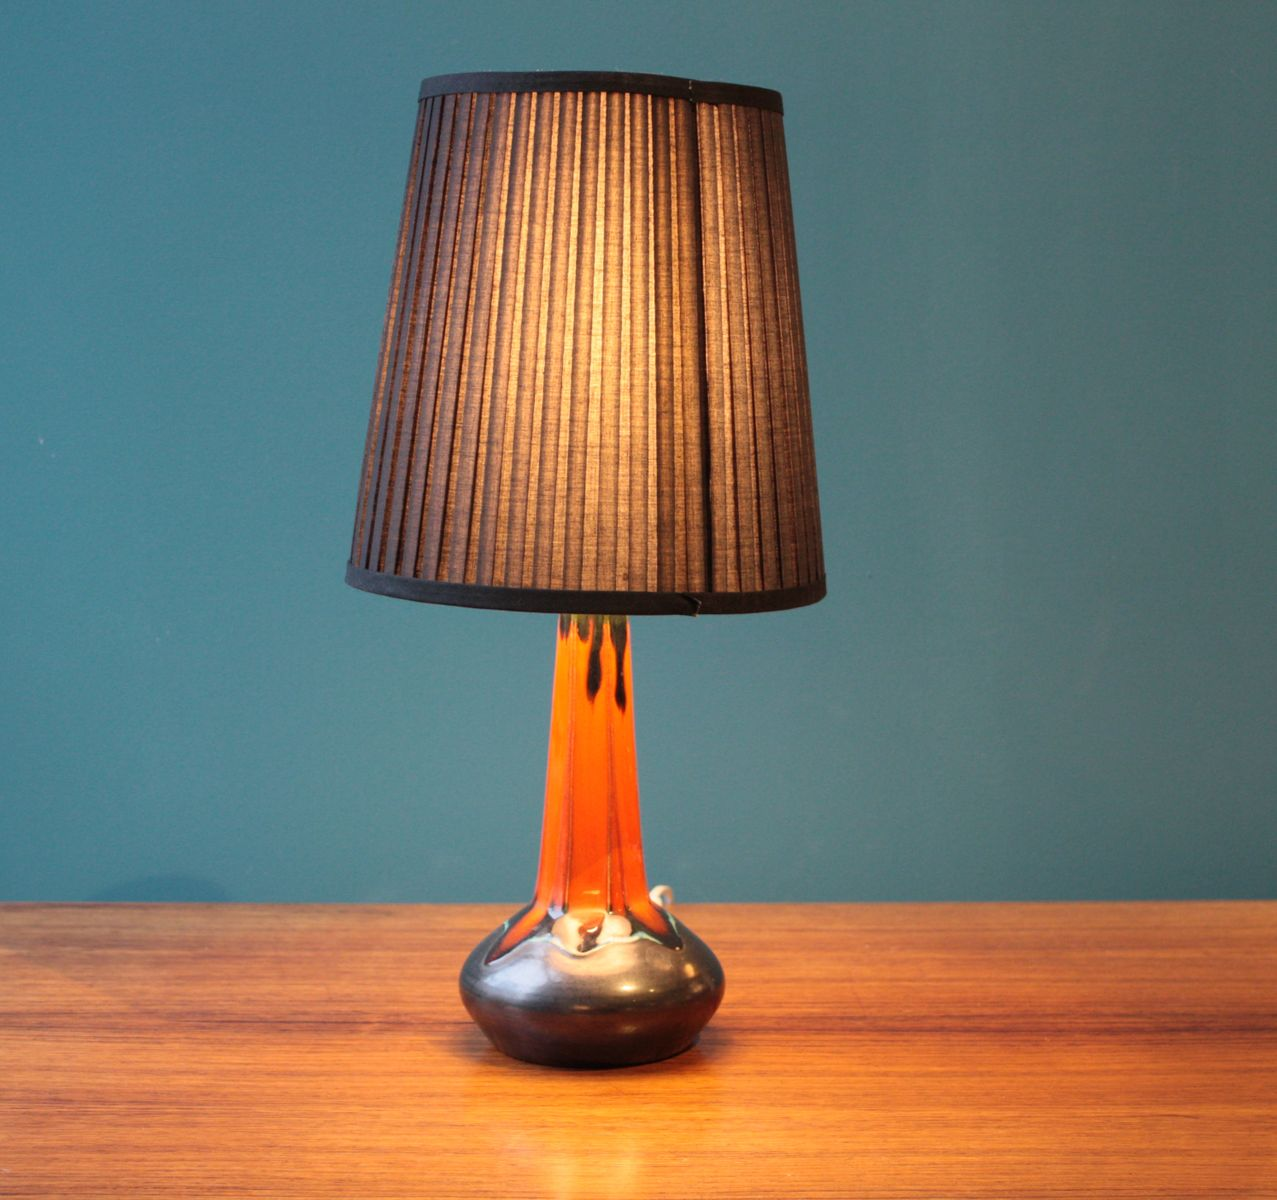 lampe de bureau vintage orange en c ramique danemark en vente sur pamono. Black Bedroom Furniture Sets. Home Design Ideas